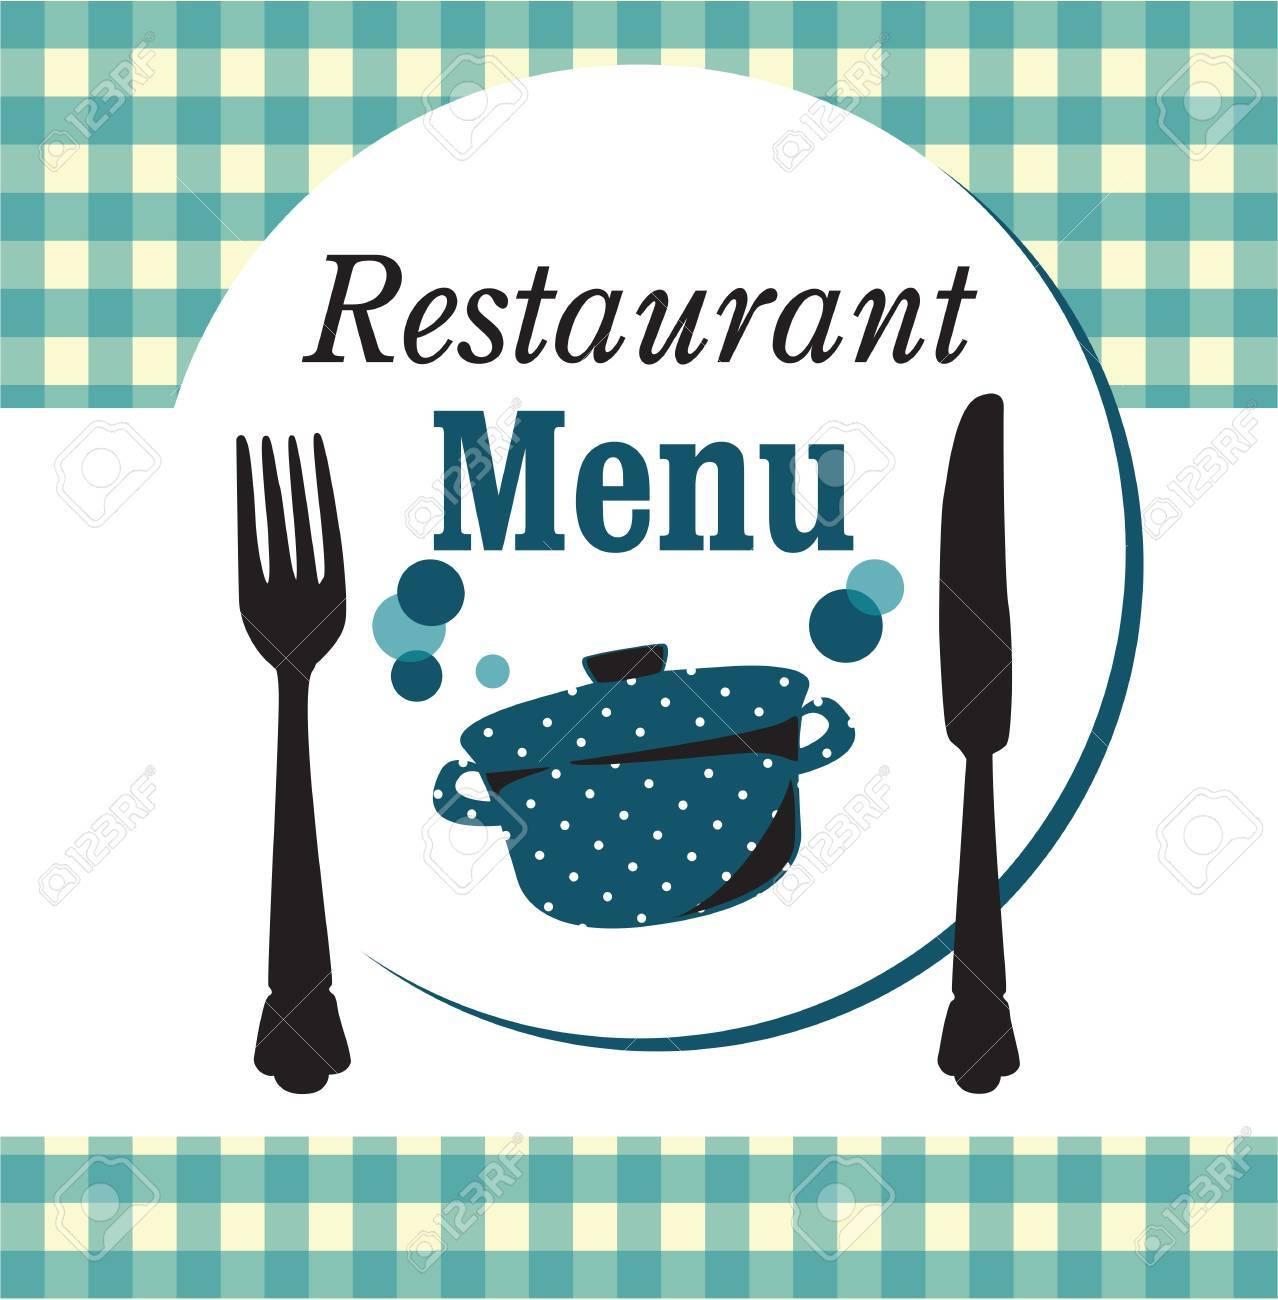 restaurant menu design Stock Vector - 20154641